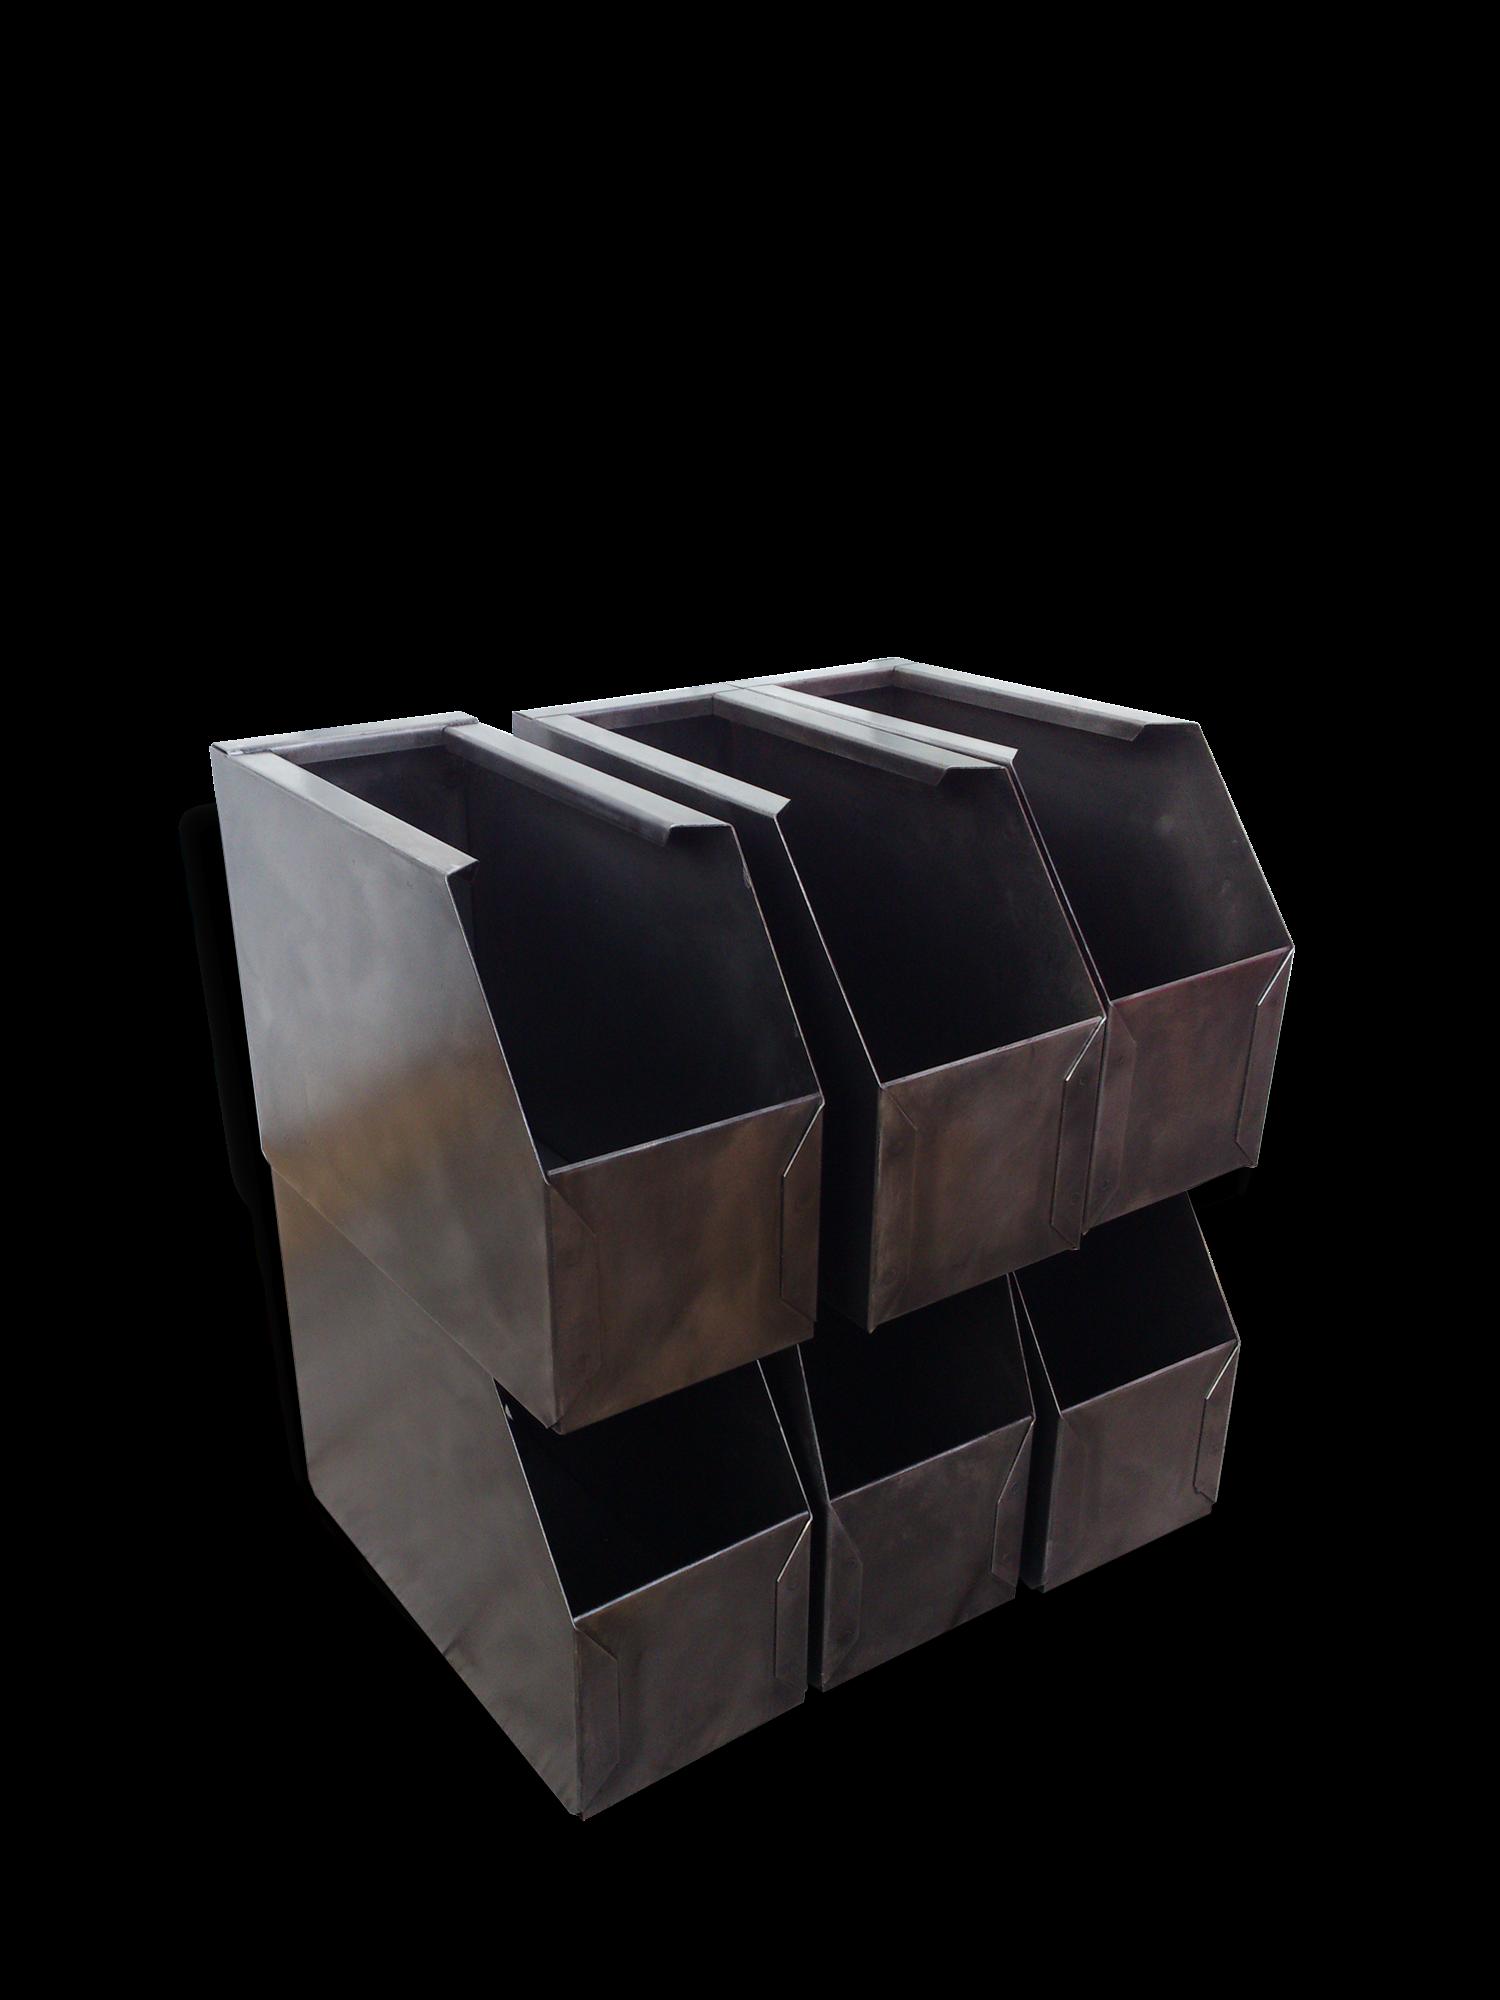 caisse de rangement mtallique interesting with caisse de rangement mtallique amazing caisse de. Black Bedroom Furniture Sets. Home Design Ideas